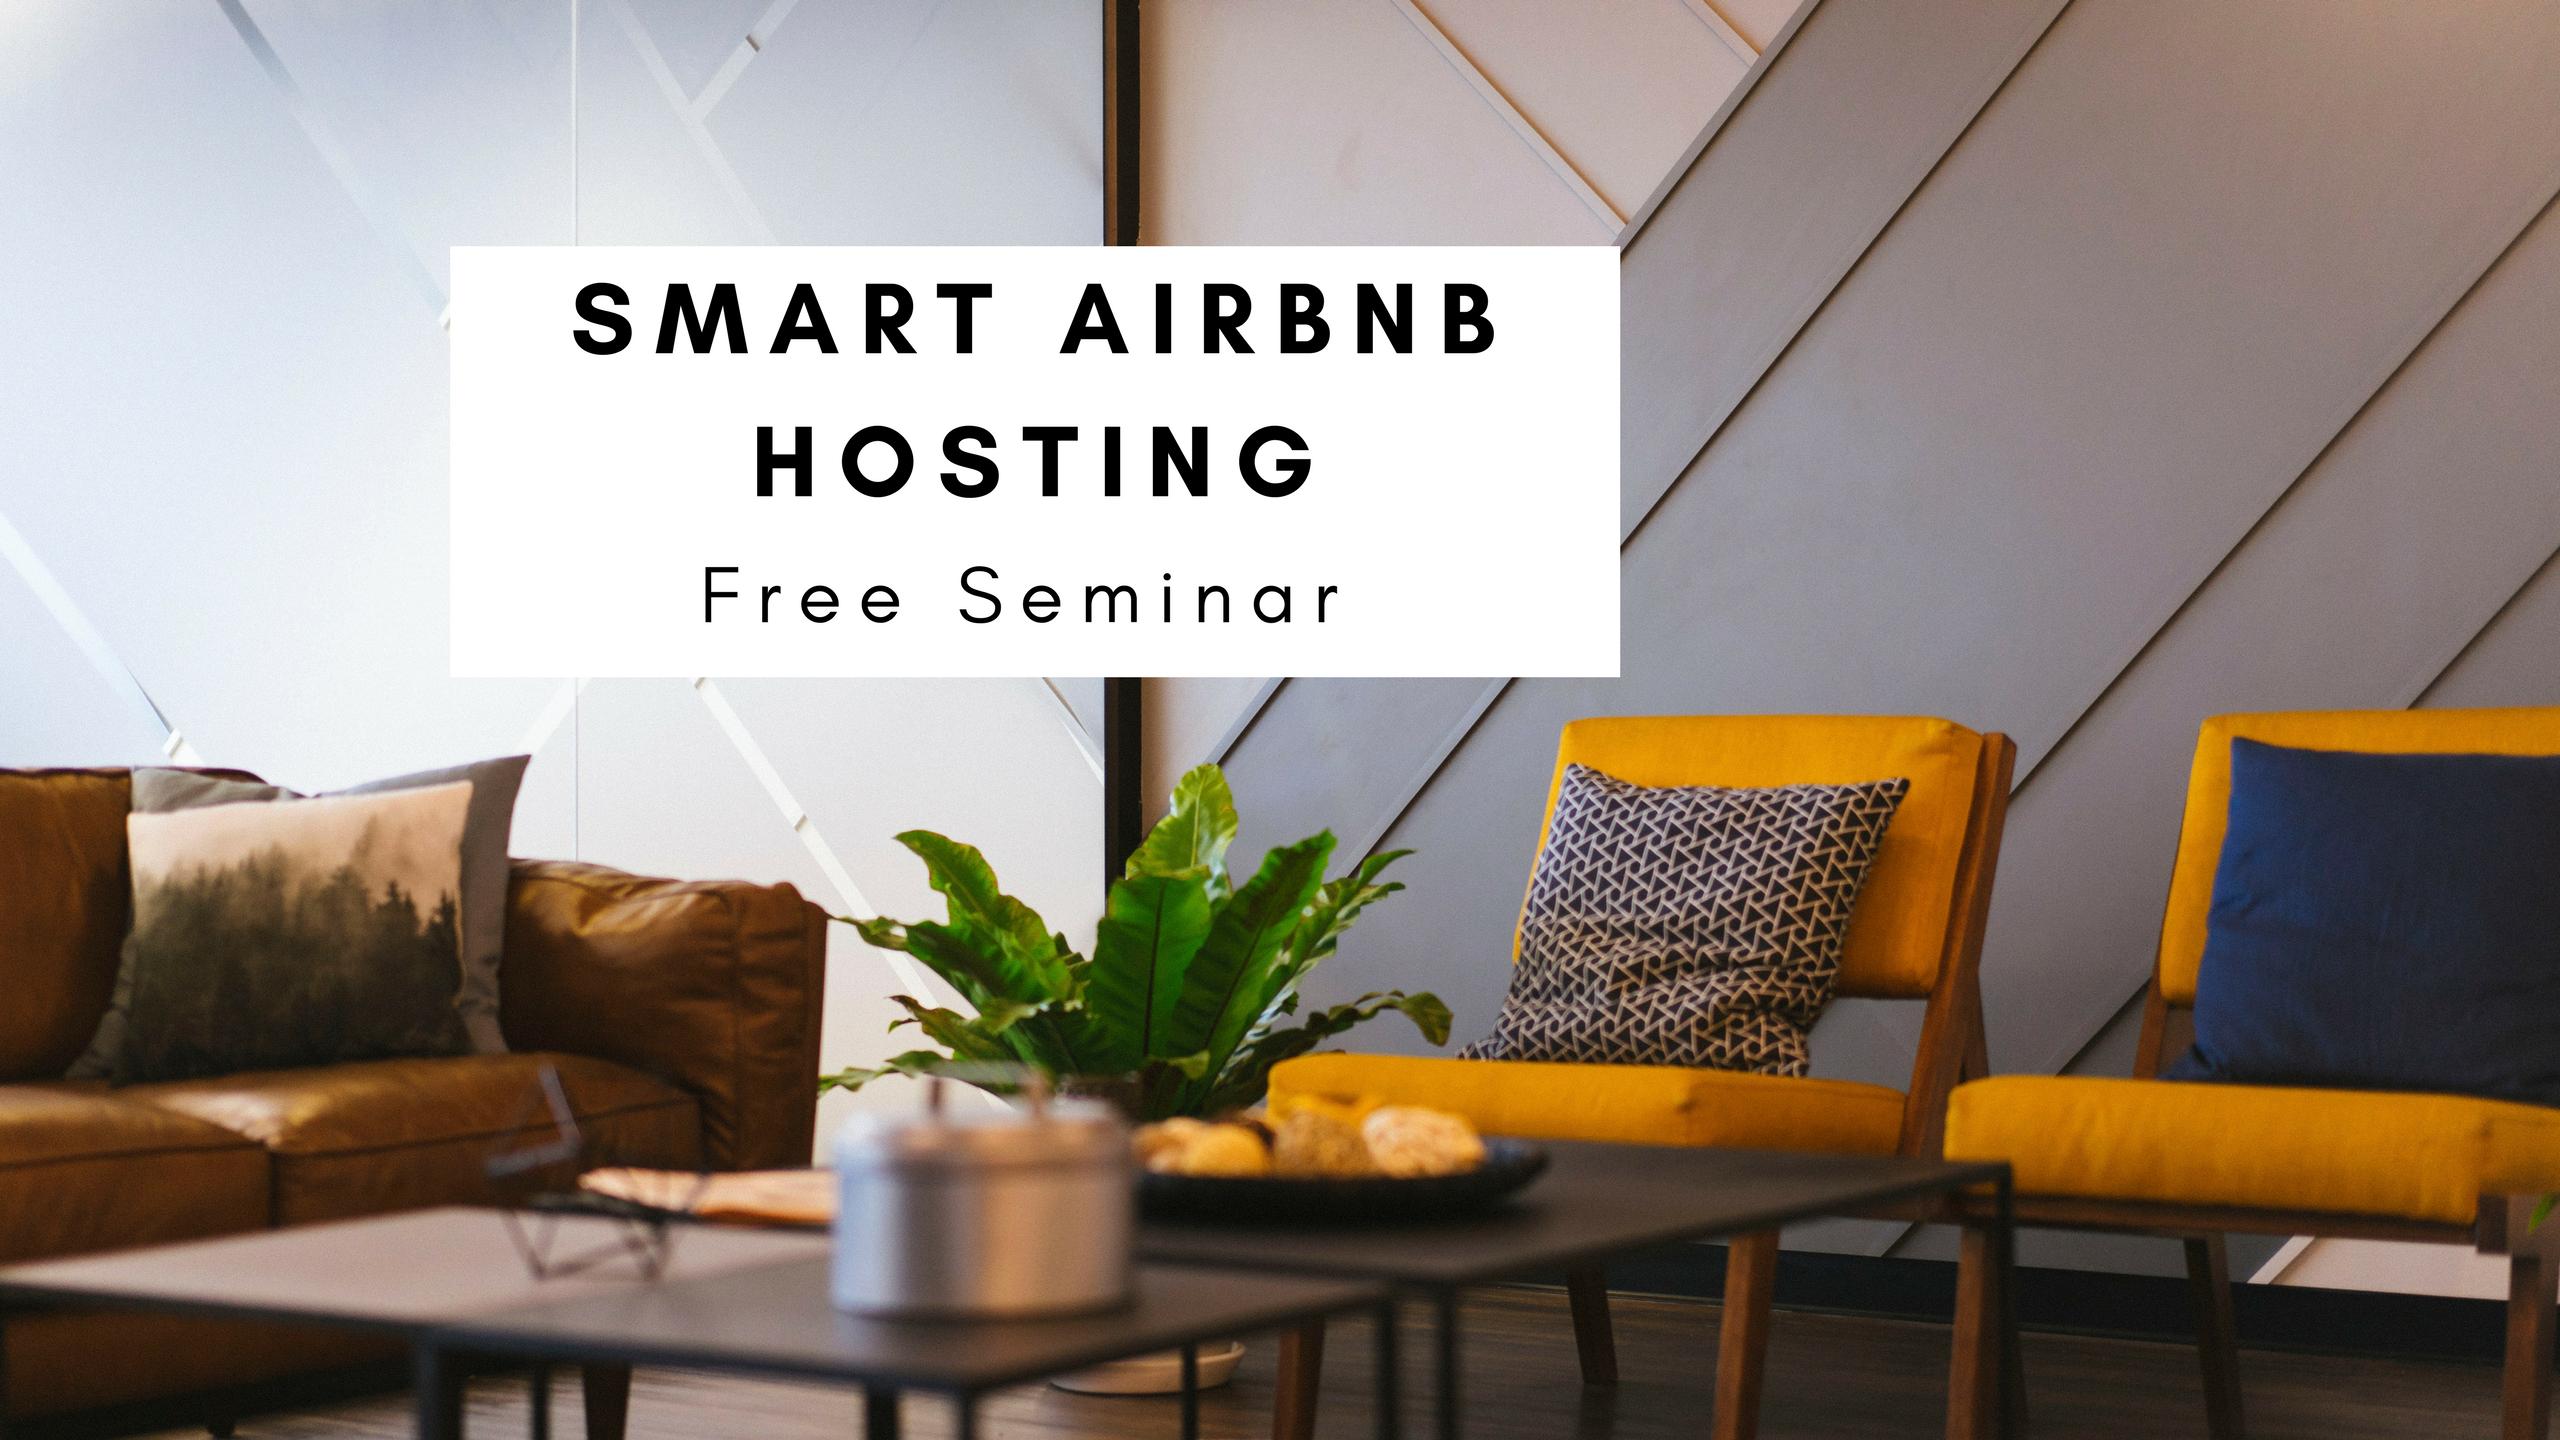 Smart Airbnb Hosting Seminar